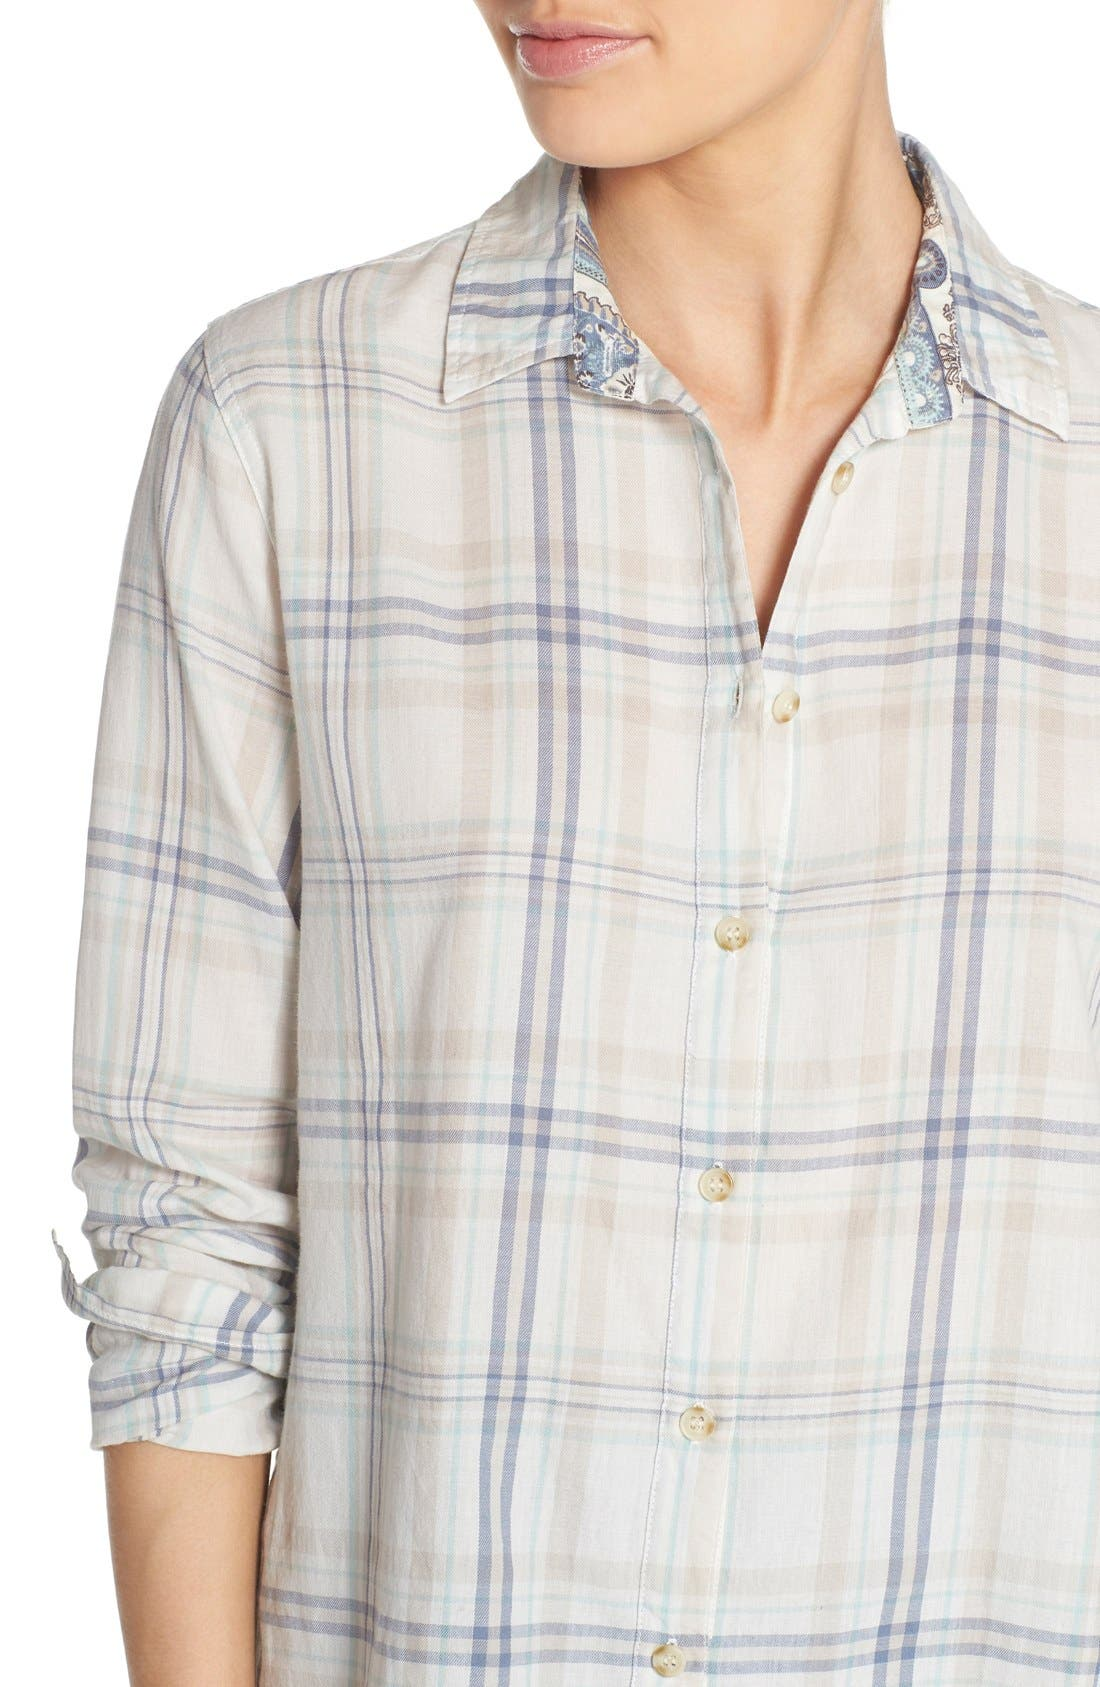 Alternate Image 4  - PJ Salvage Plaid Cotton Twill Shirt